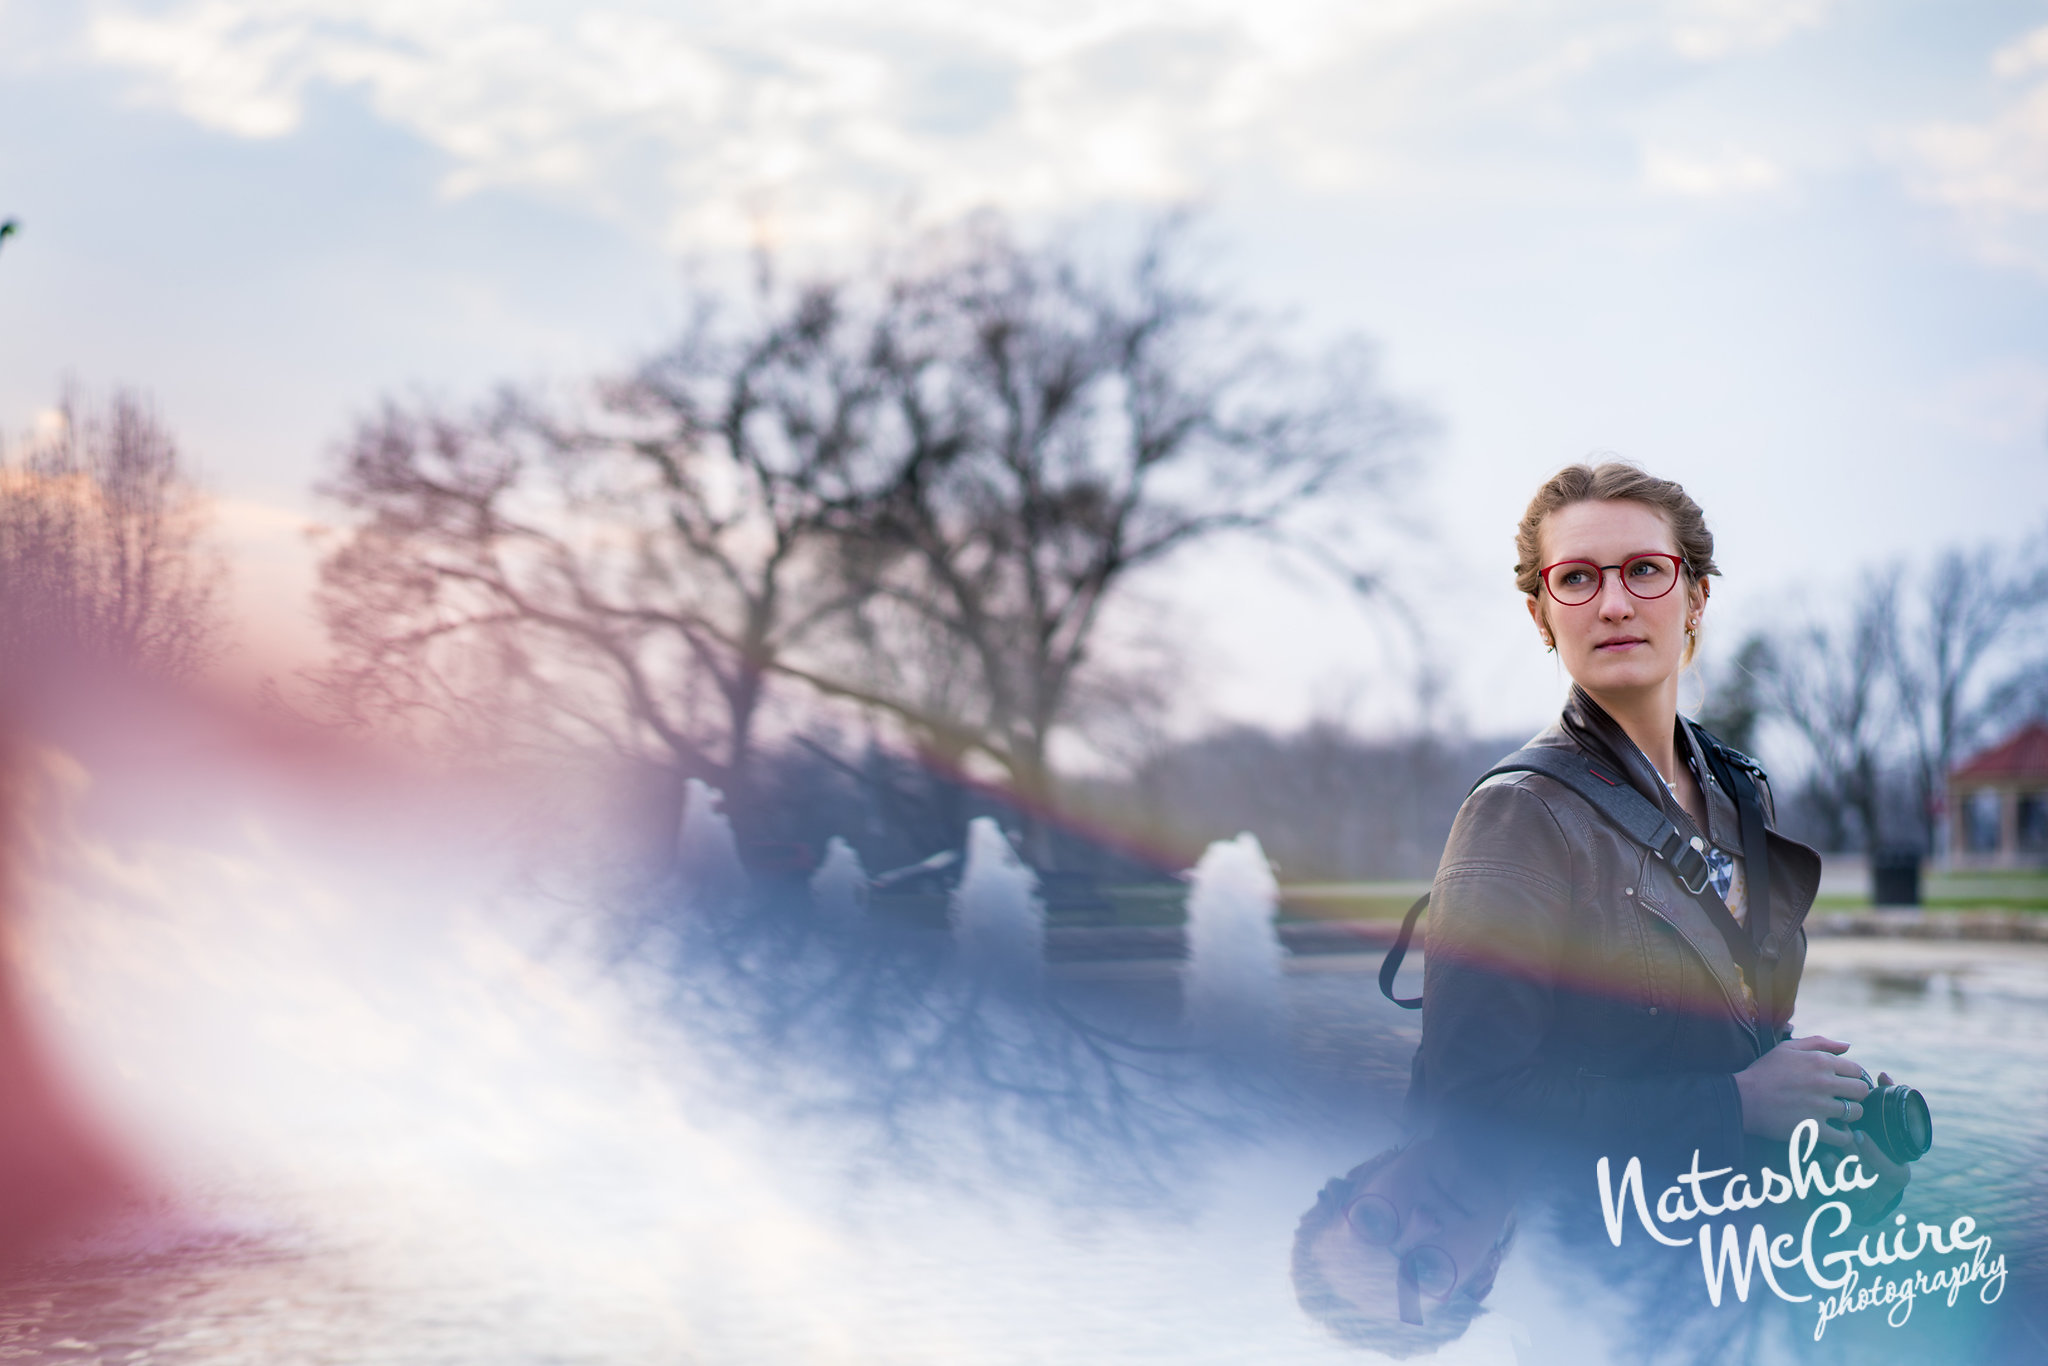 KansasCityPhotographersPrisms-5.jpg